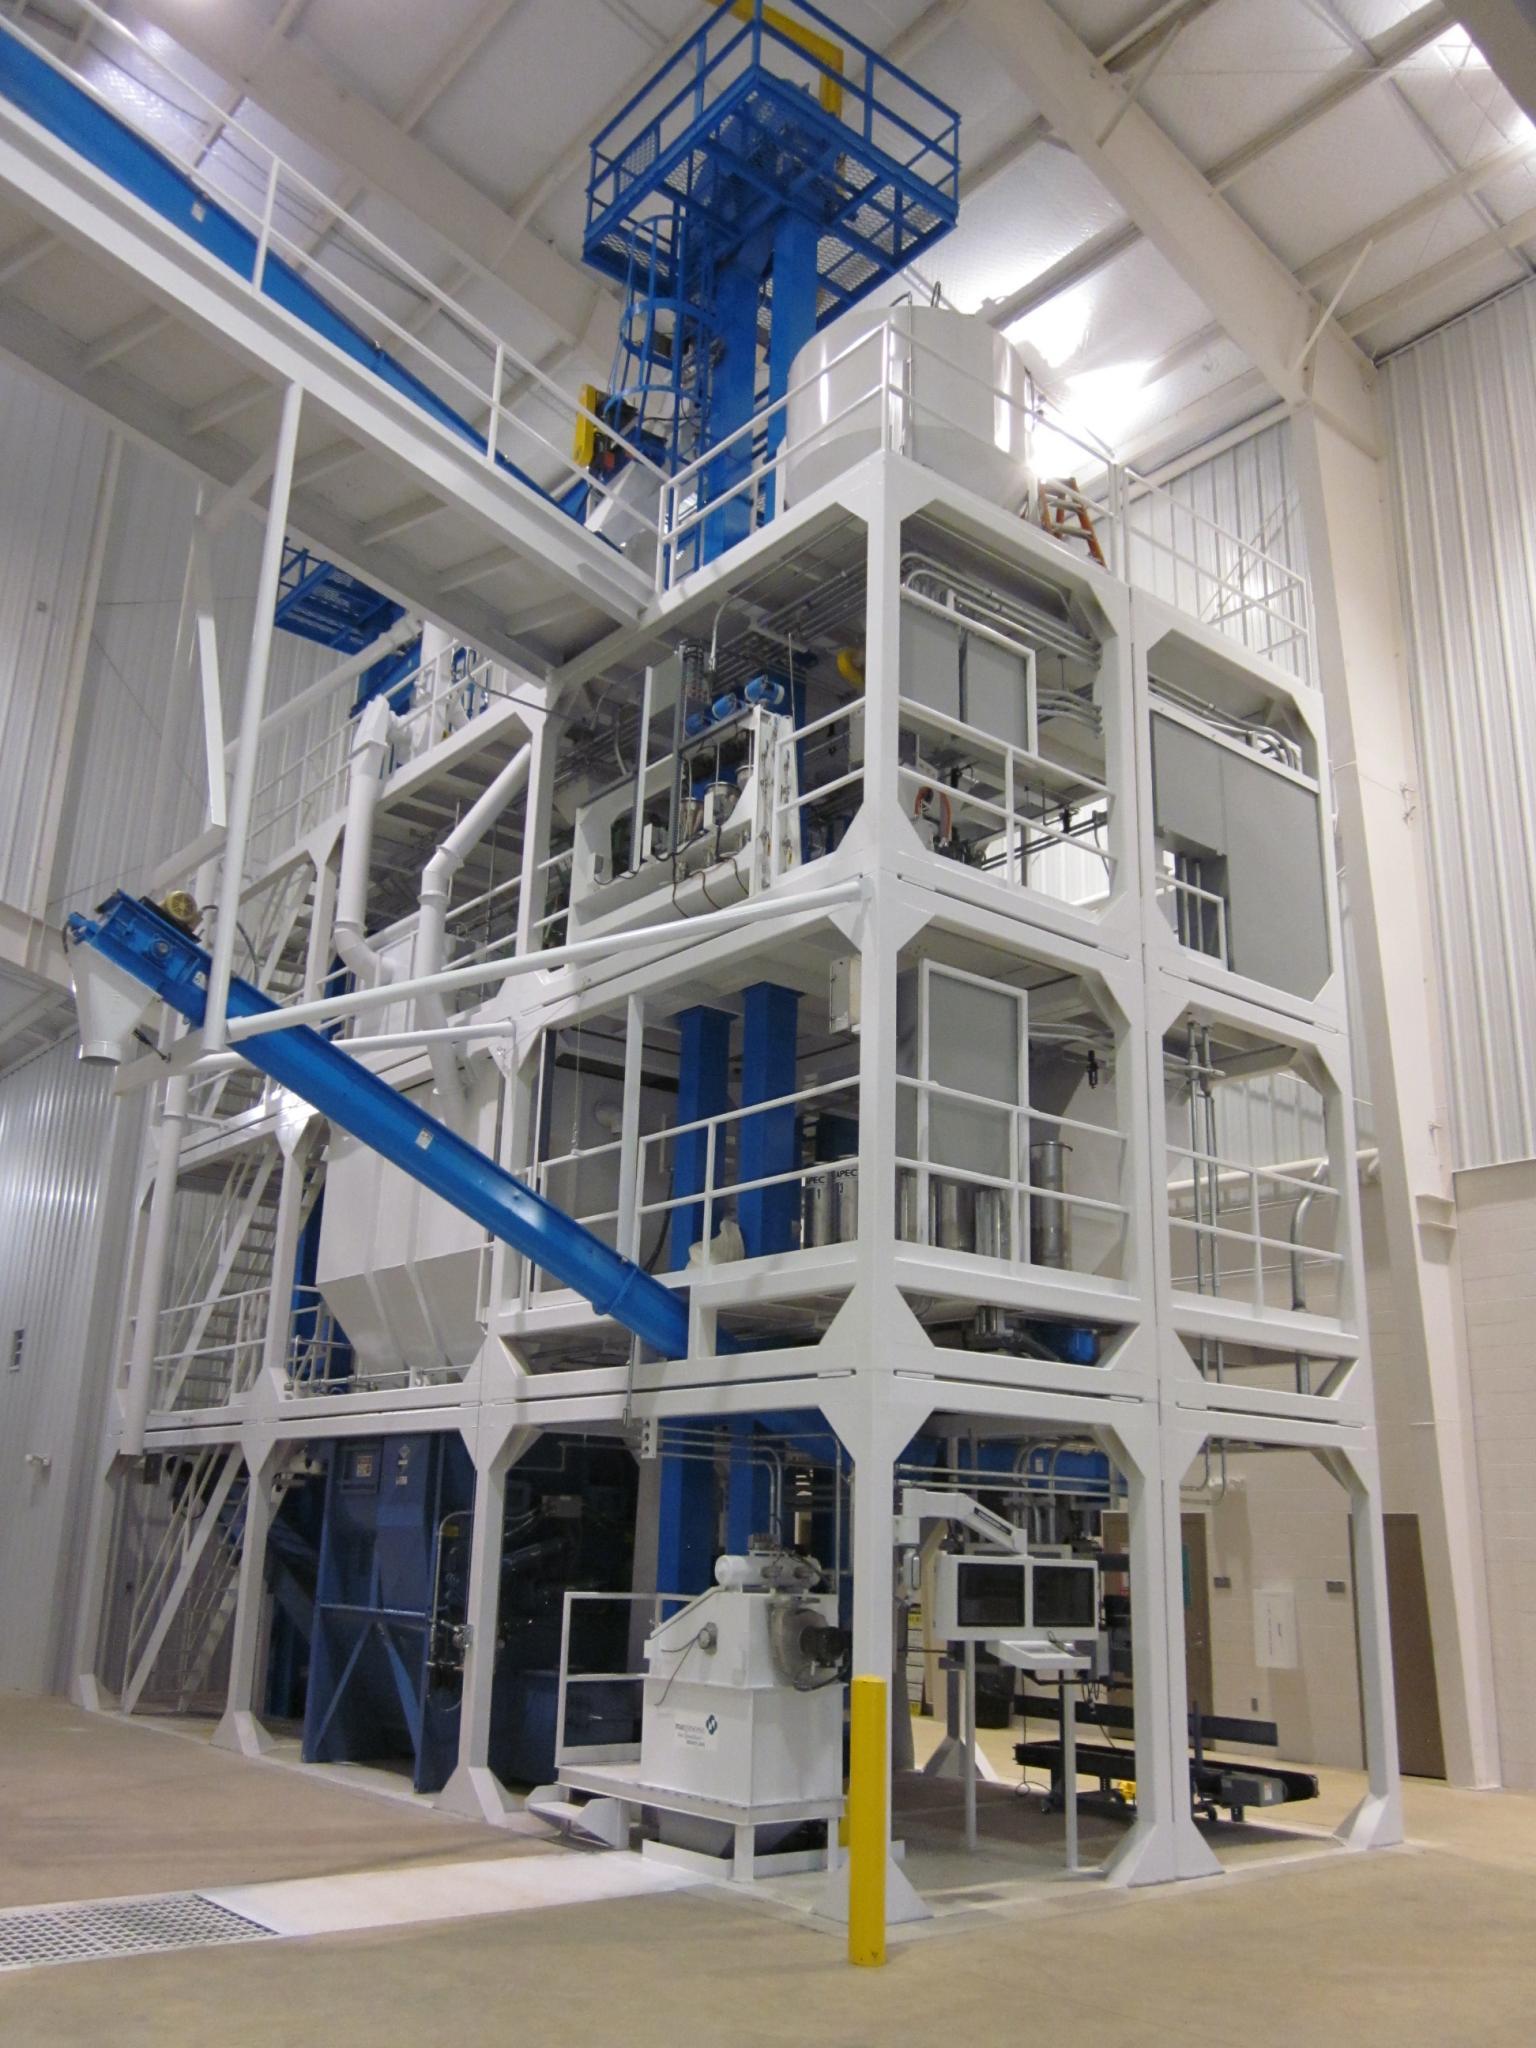 The custom feed mill at Auburn University